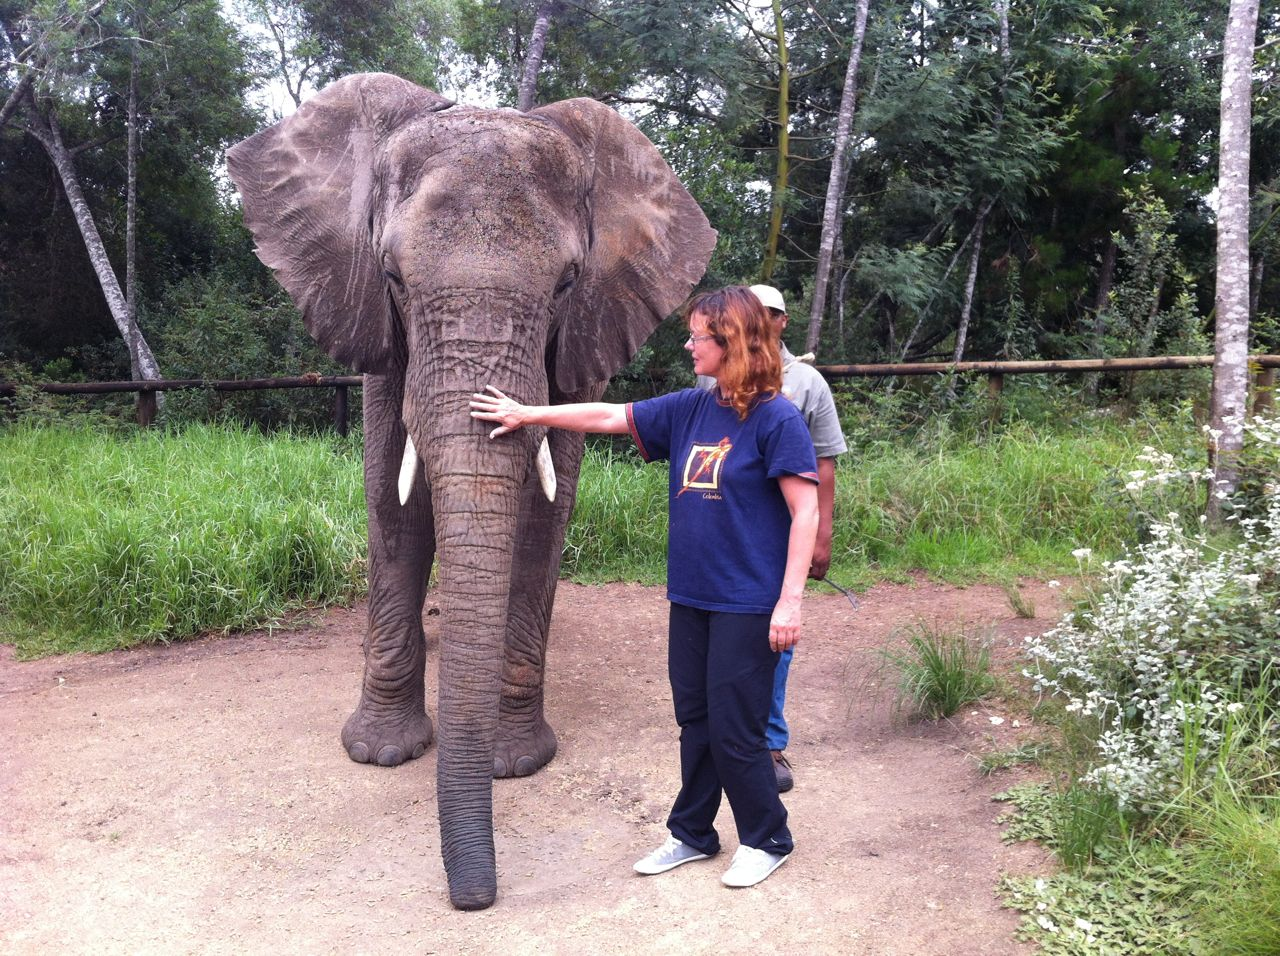 Elephant Sanctuary, Plettenberg Bay © greyworldnomads